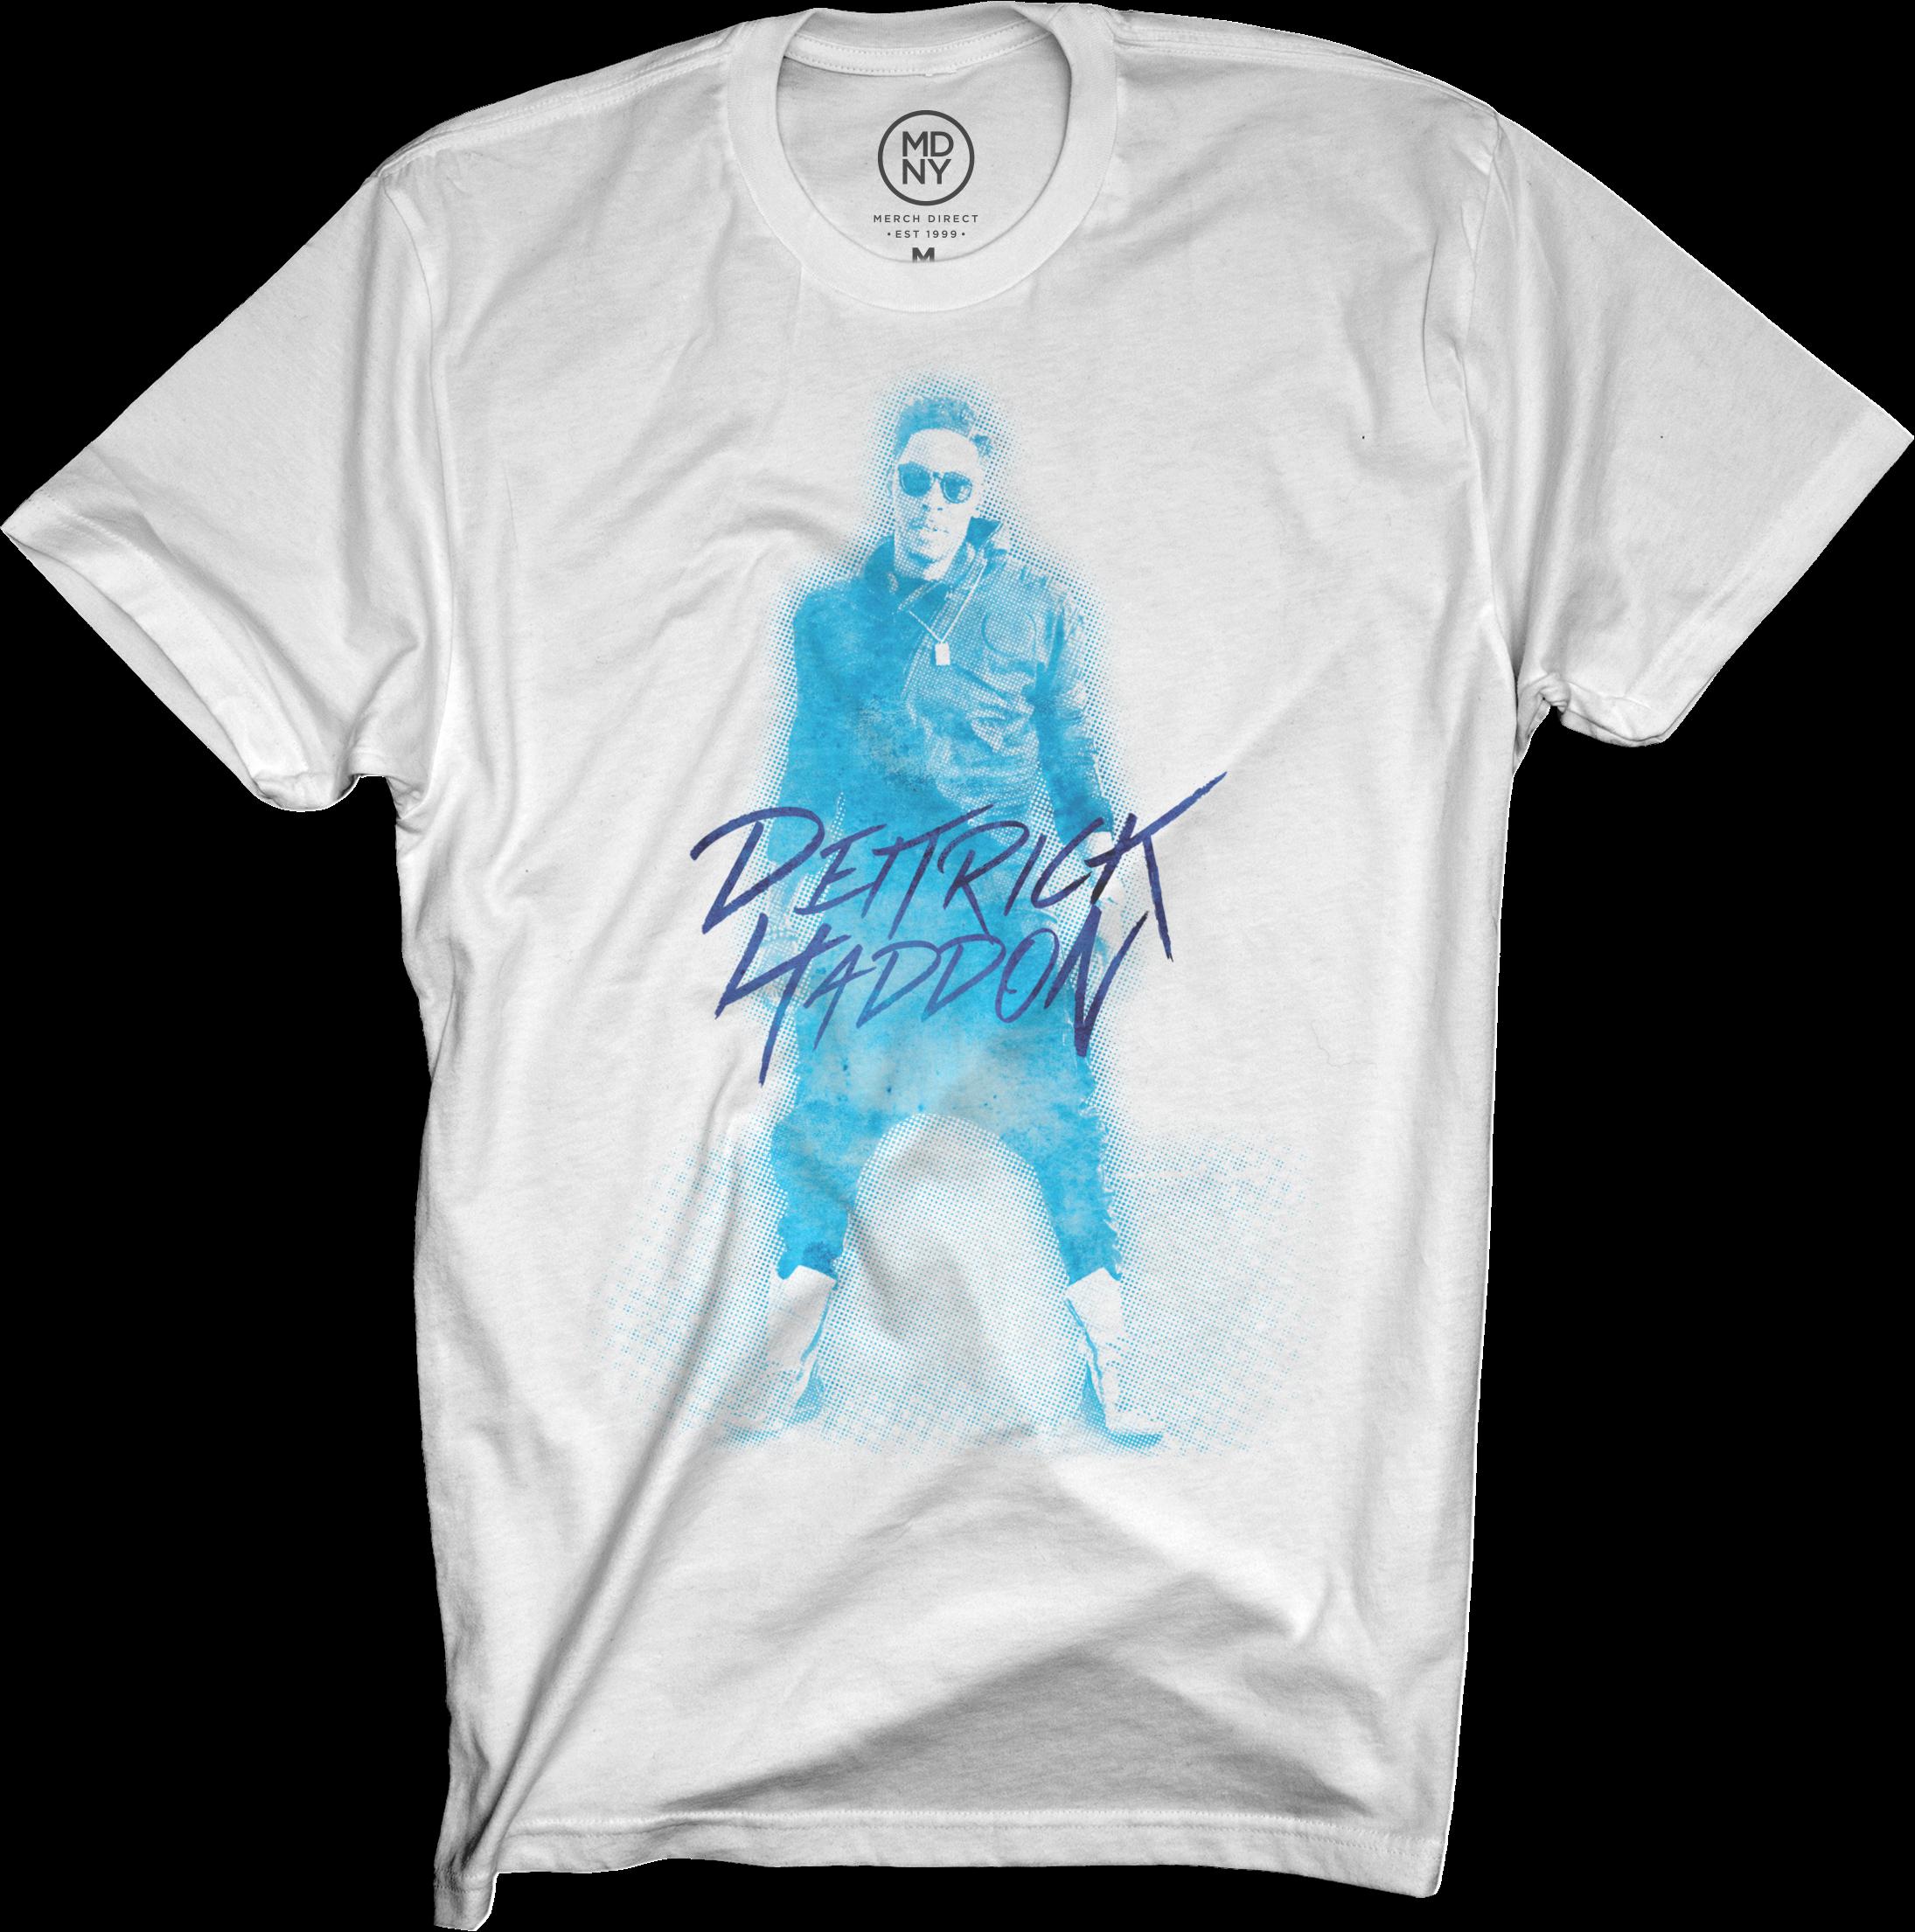 Dietrick Haddon - Blue Photo on White T-Shirt